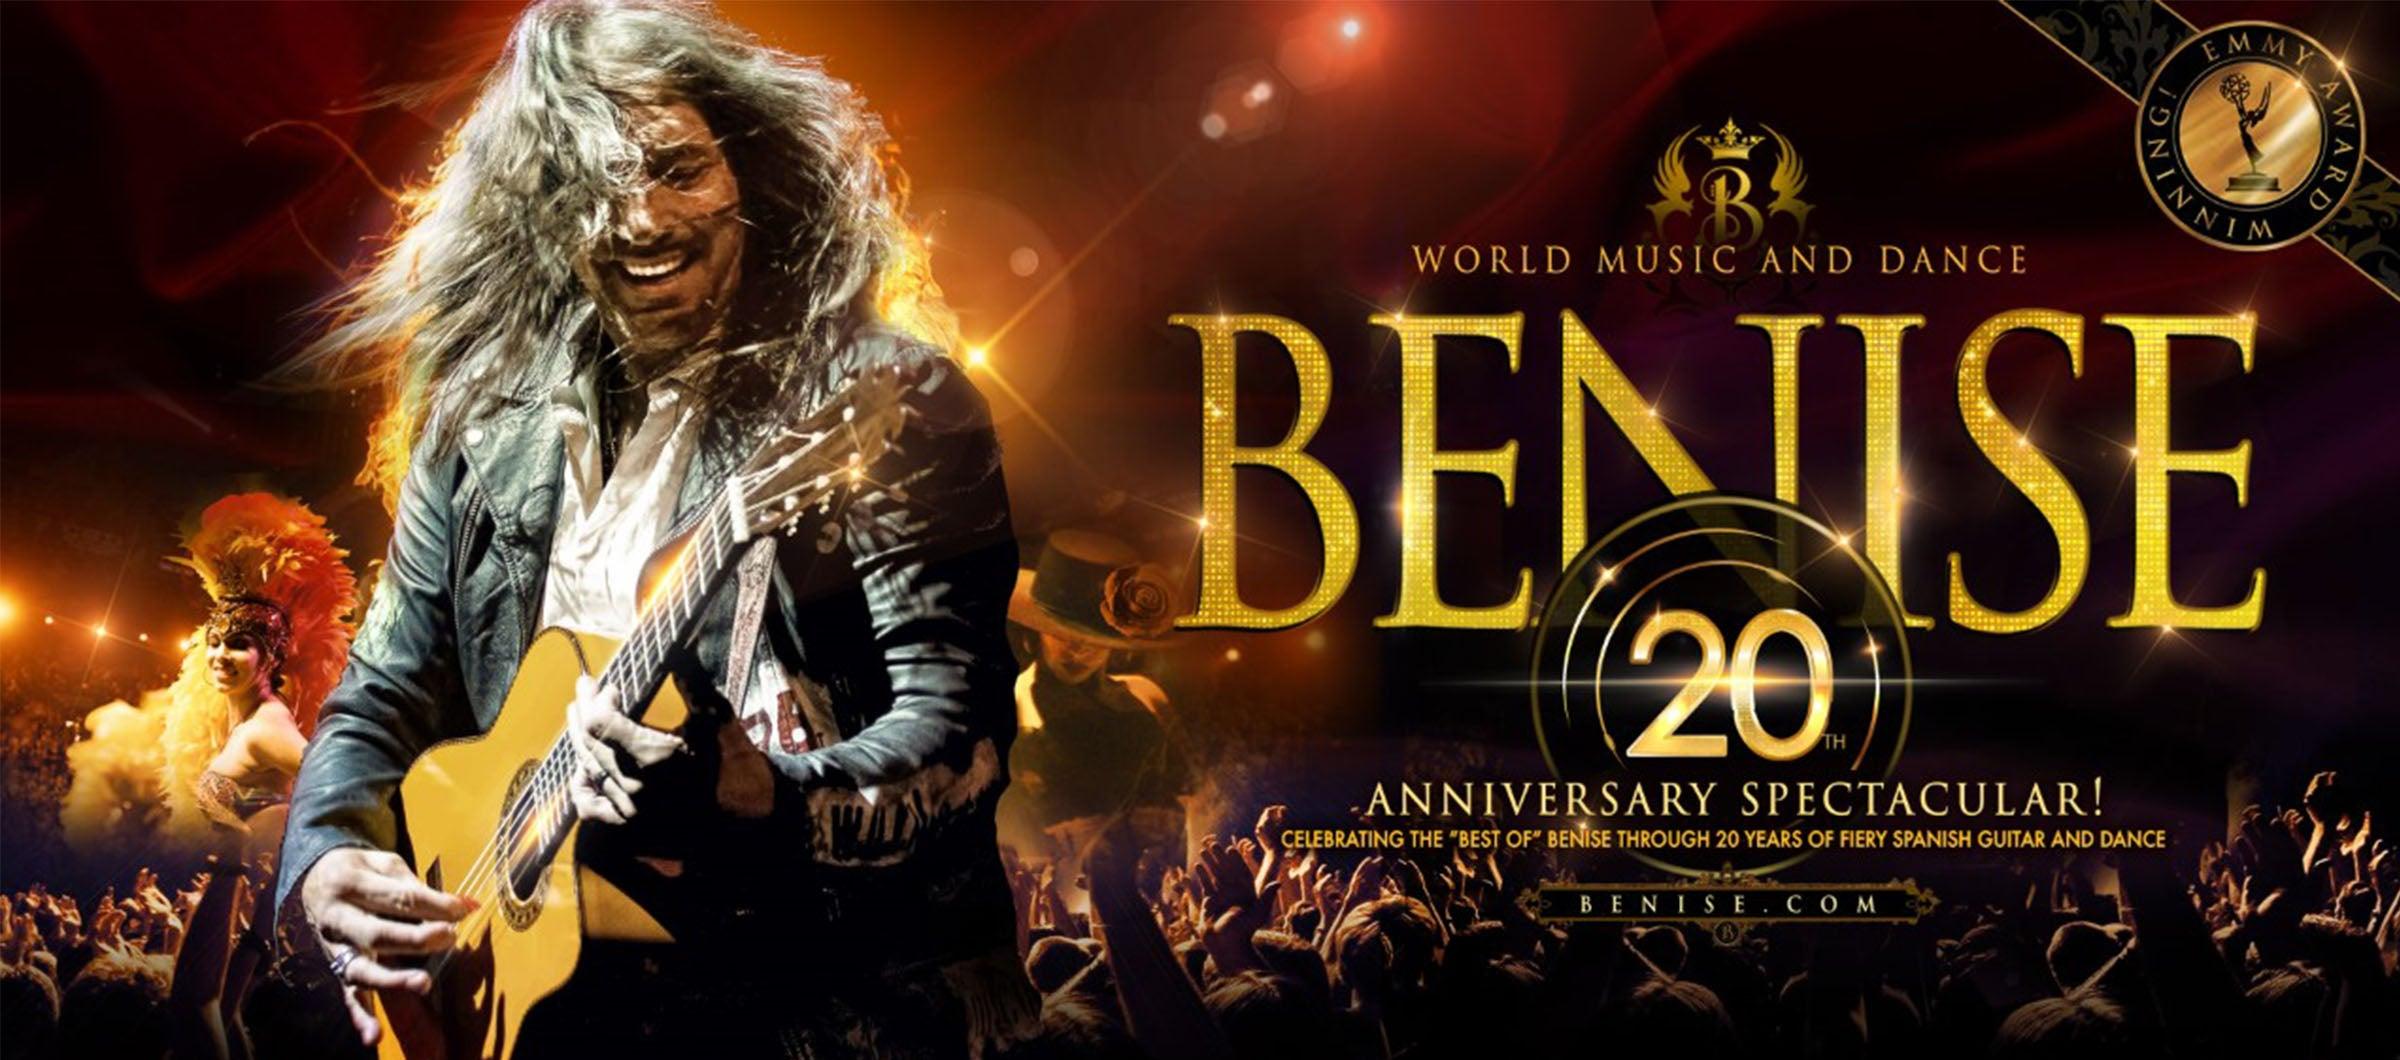 Benise - 20th Anniversary Tour